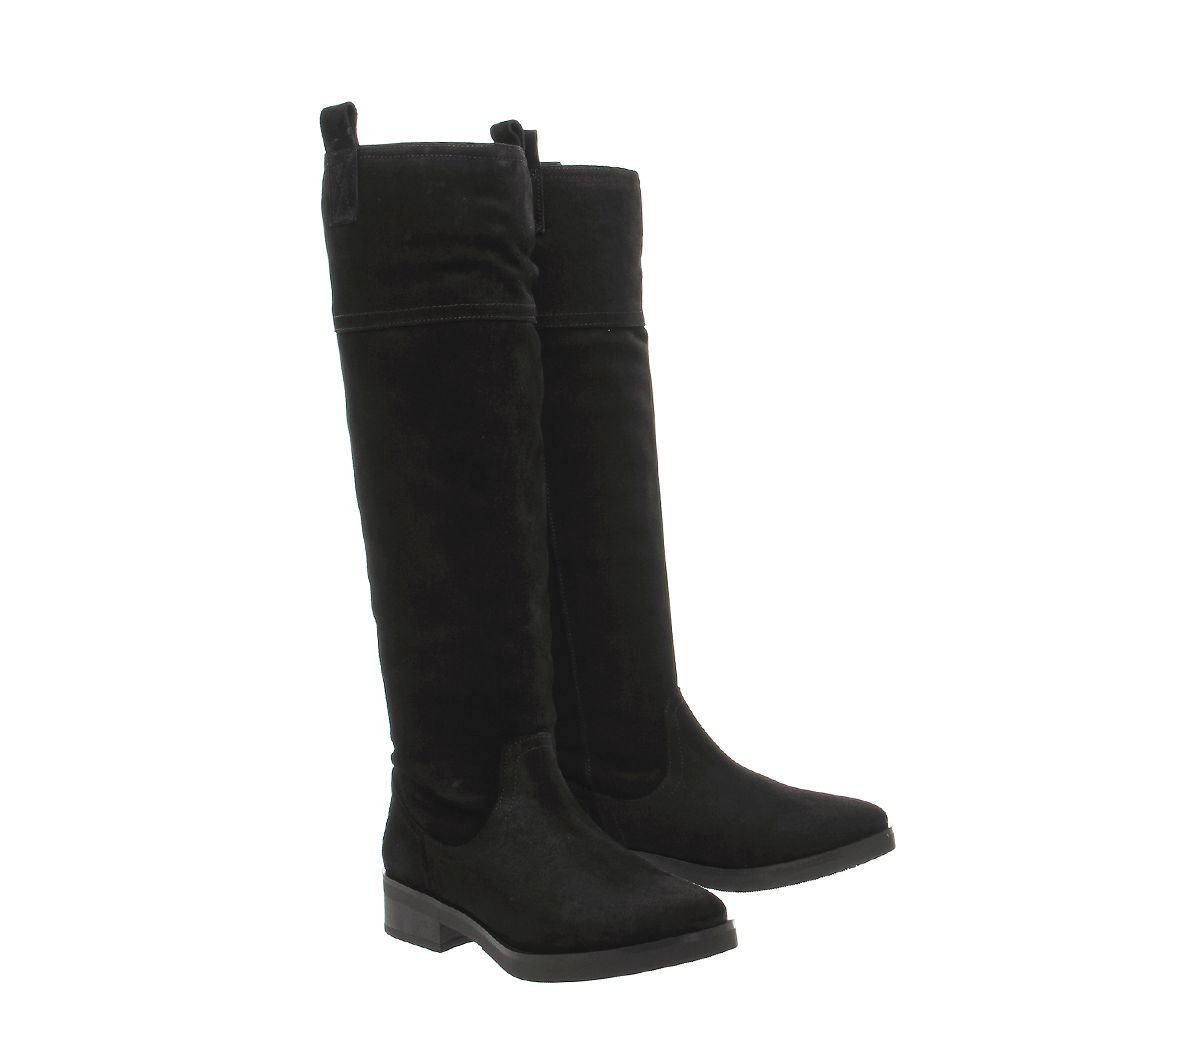 Office Eastwood Knee Boots in Black Suede (Black)